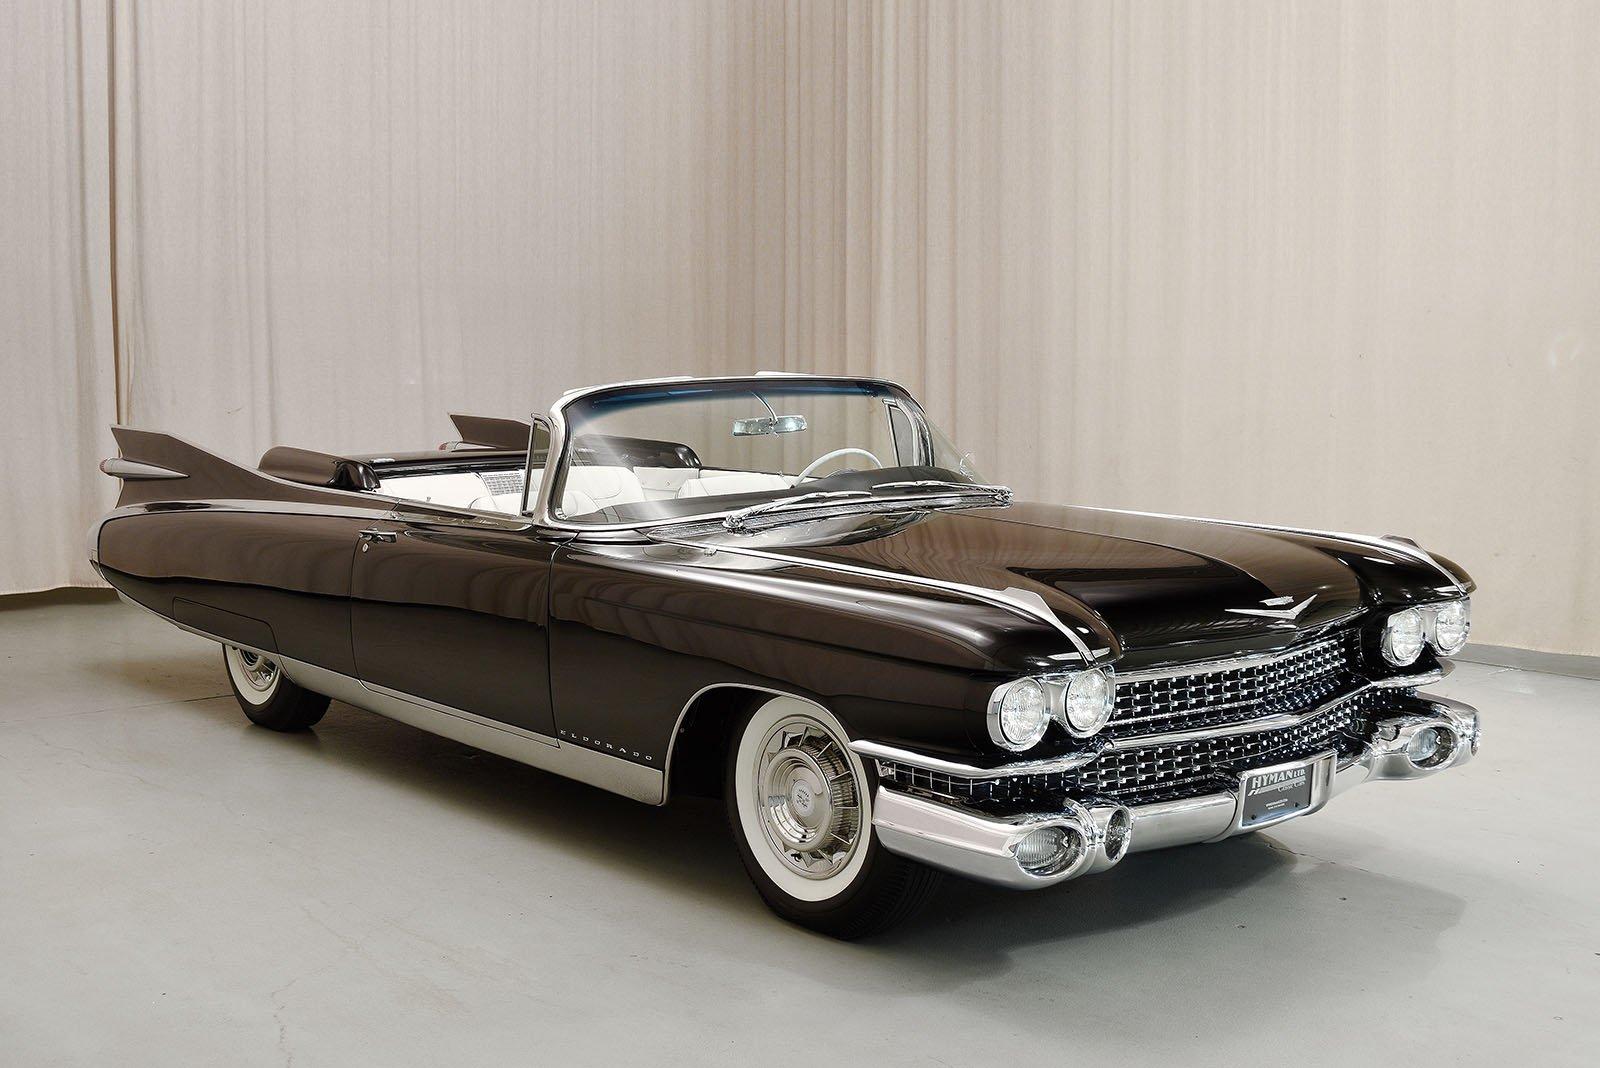 Cadillac Convertible 2015 >> 1959 Cadillac Eldorado Biarritz Convertible | Hyman Ltd. Classic Cars